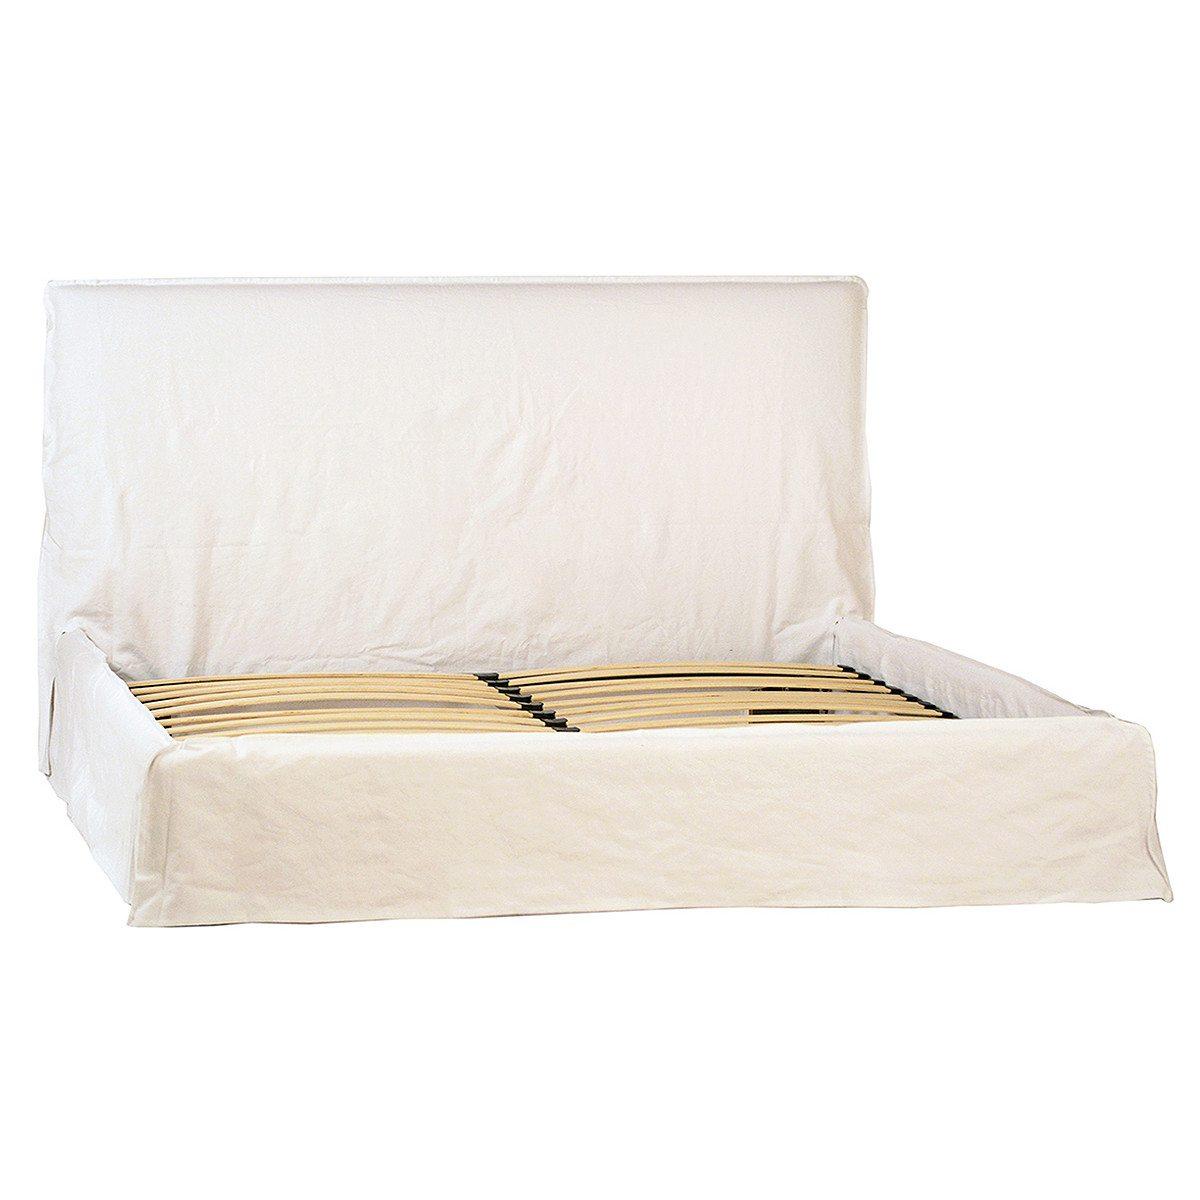 whitney-bed-shopceladon